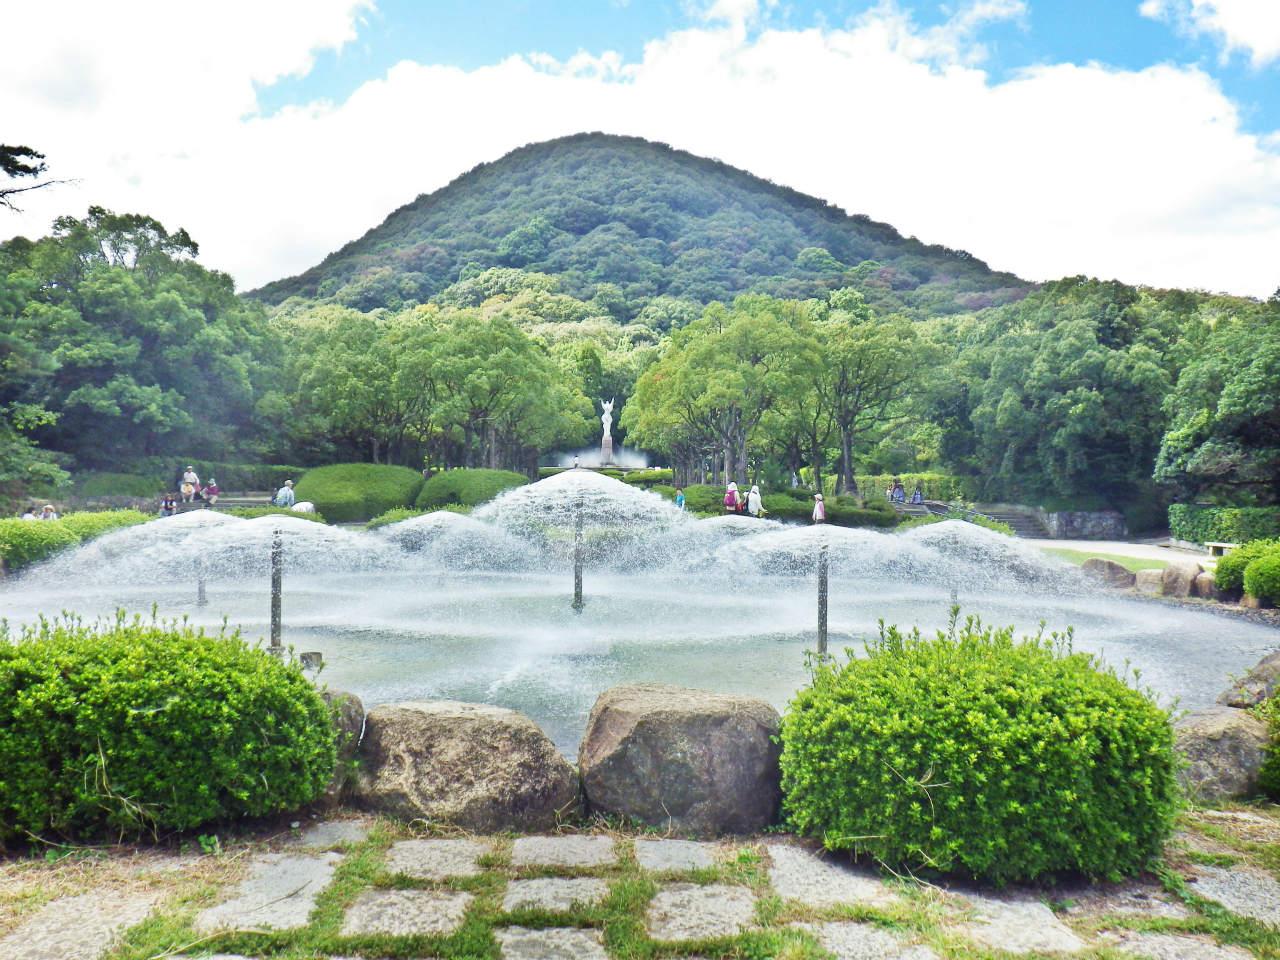 21a 傘型噴水と甲山